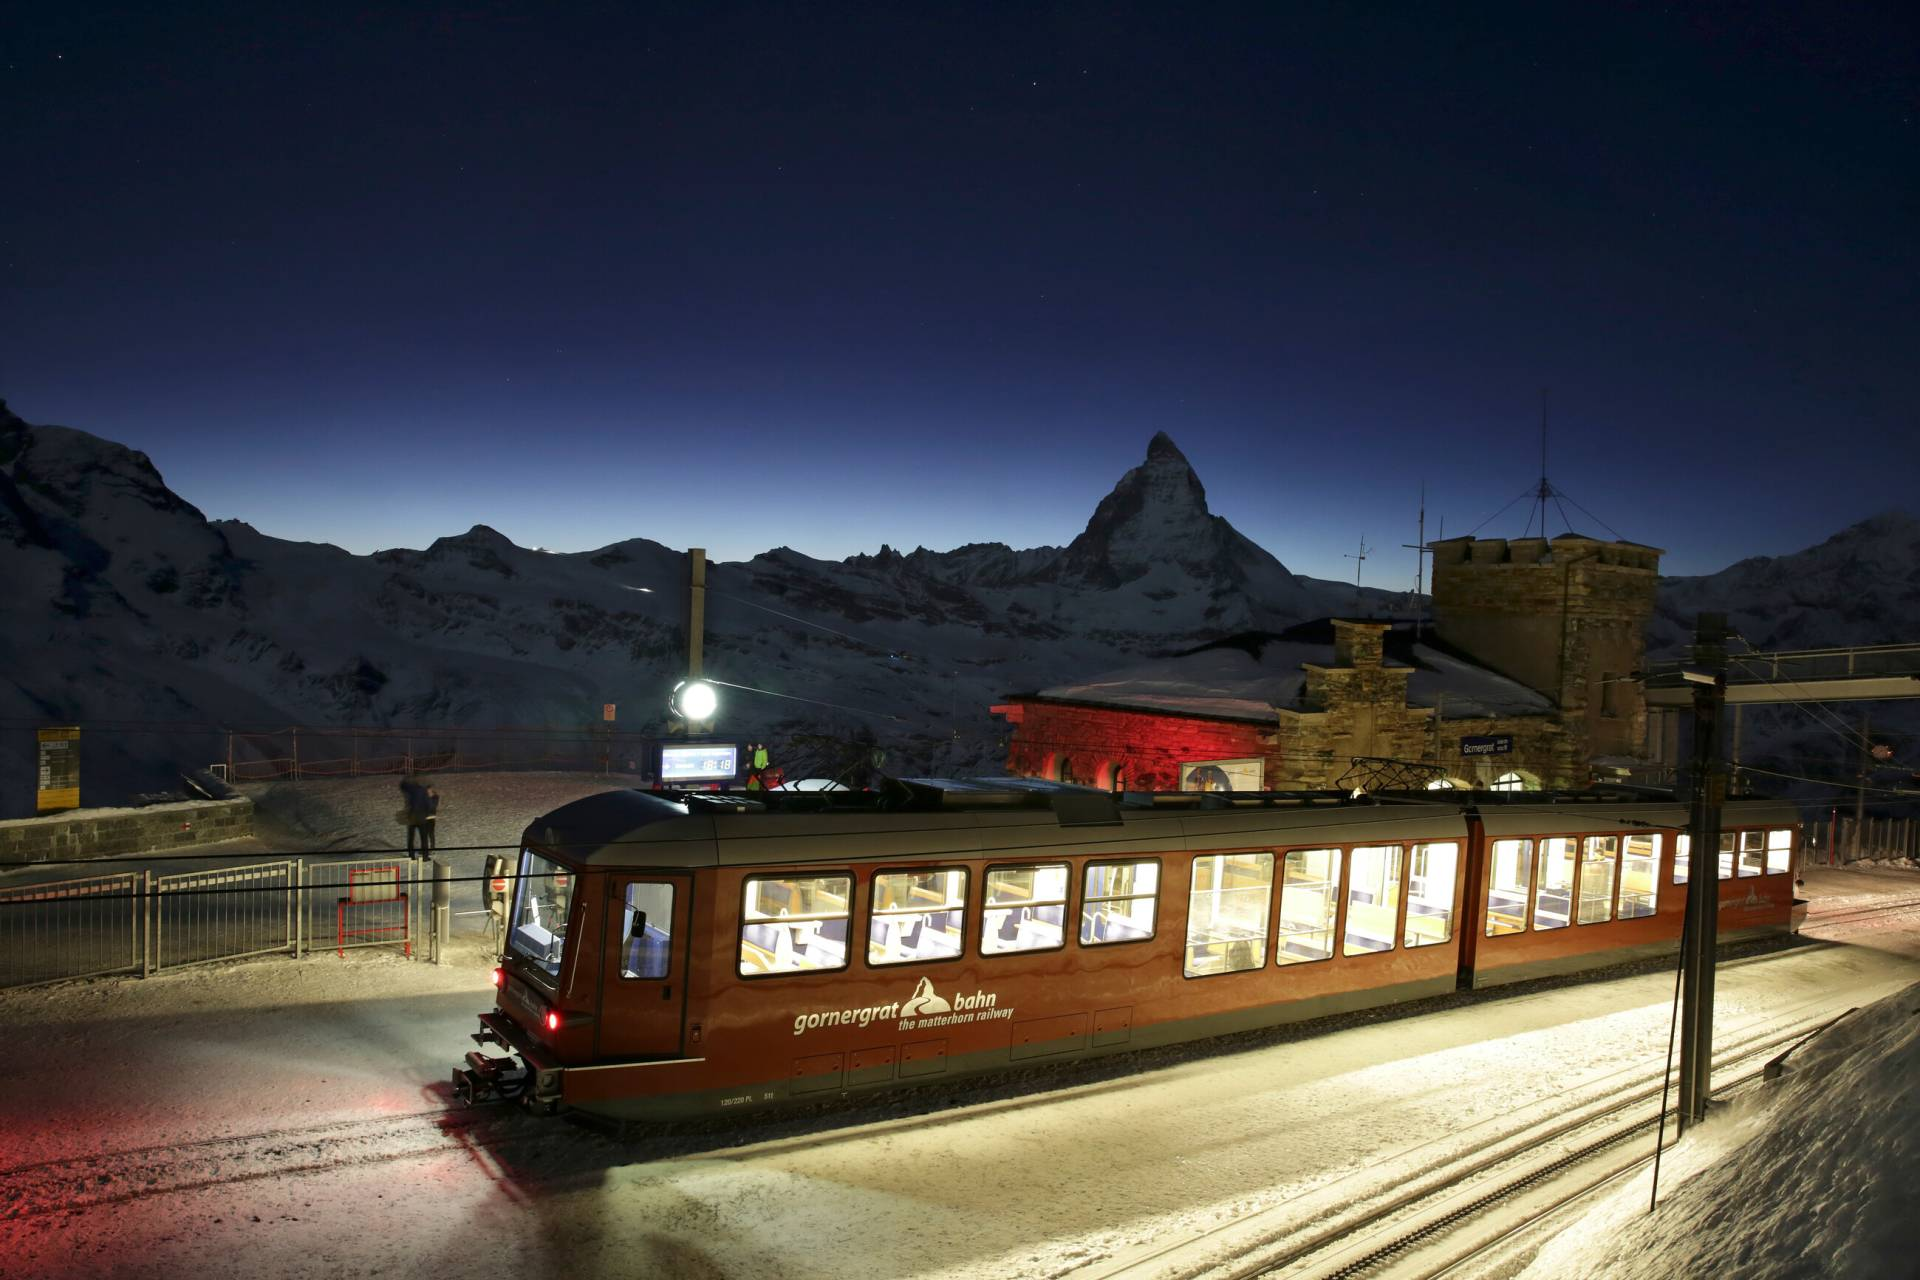 Gornergrat Bahn by night in winter